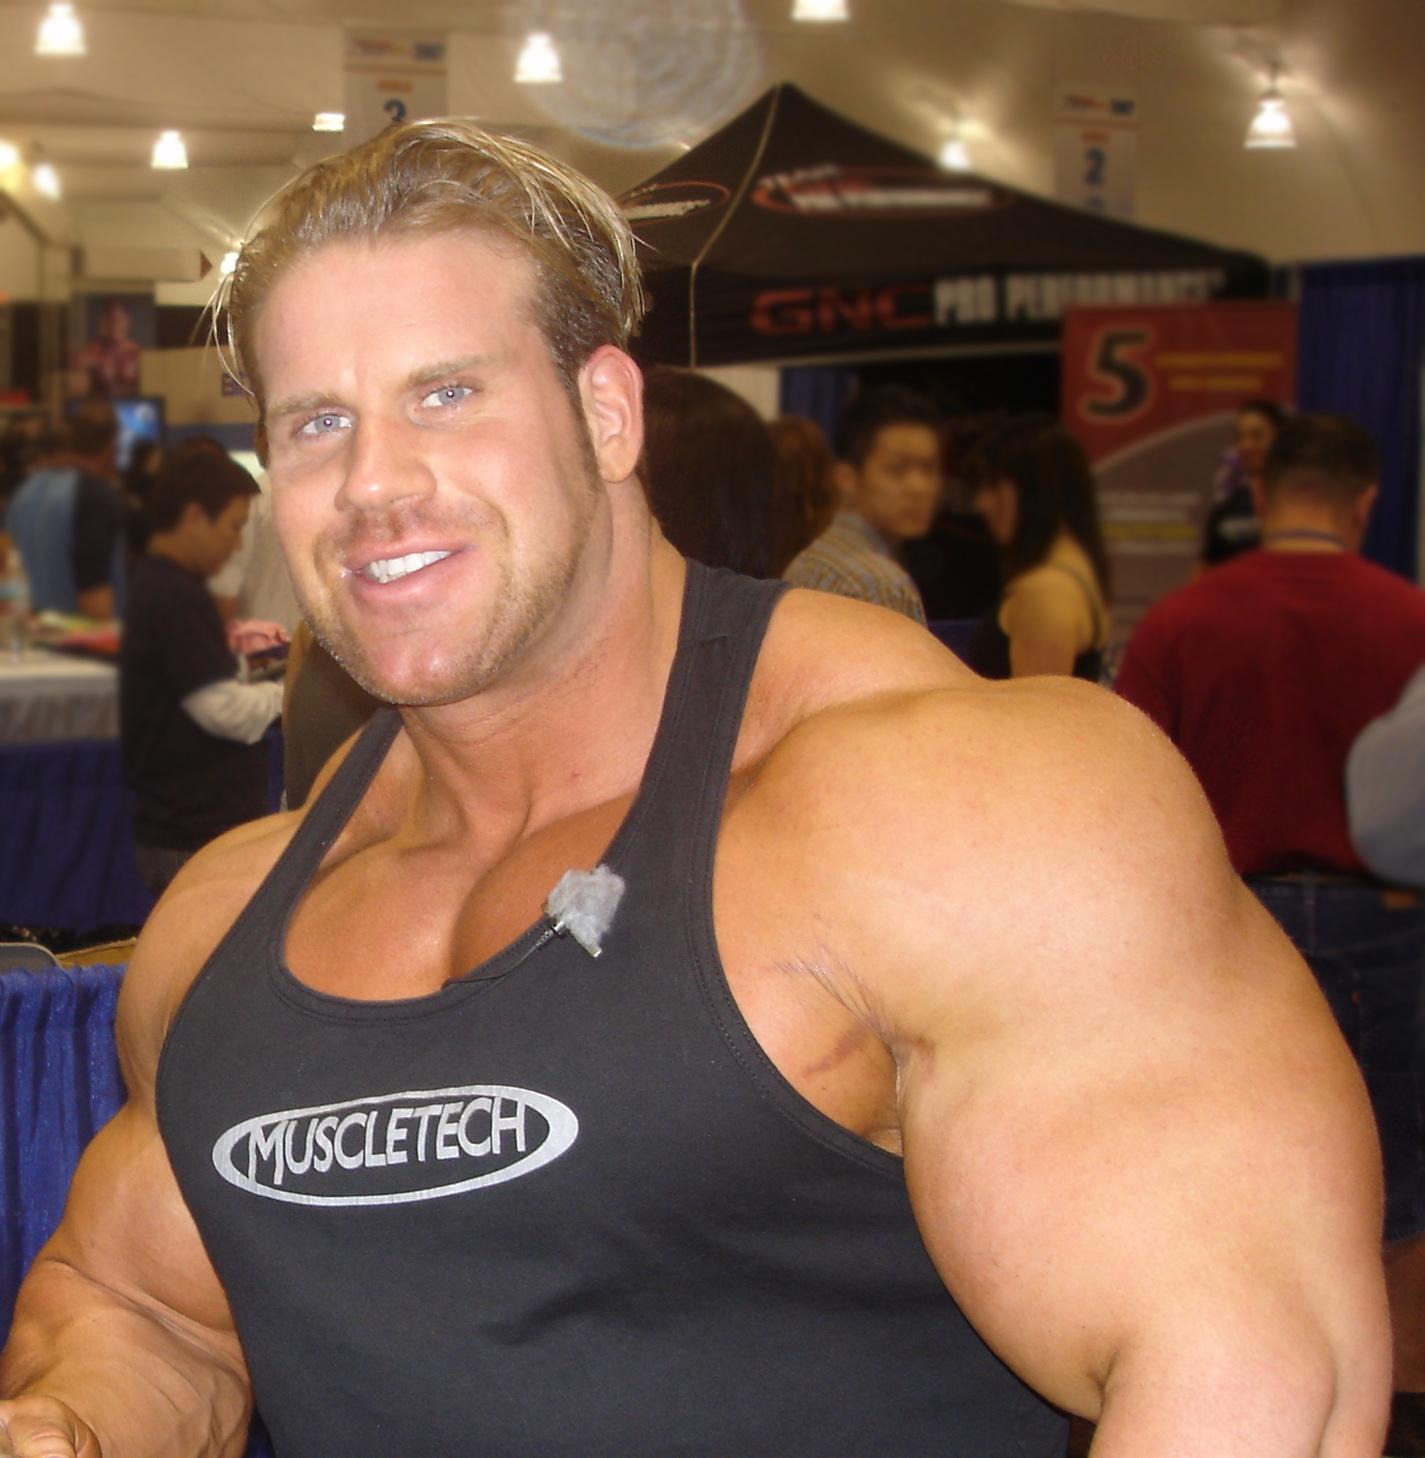 Giant Bodybuilders,Female Bodybuilding,Woman Body Building